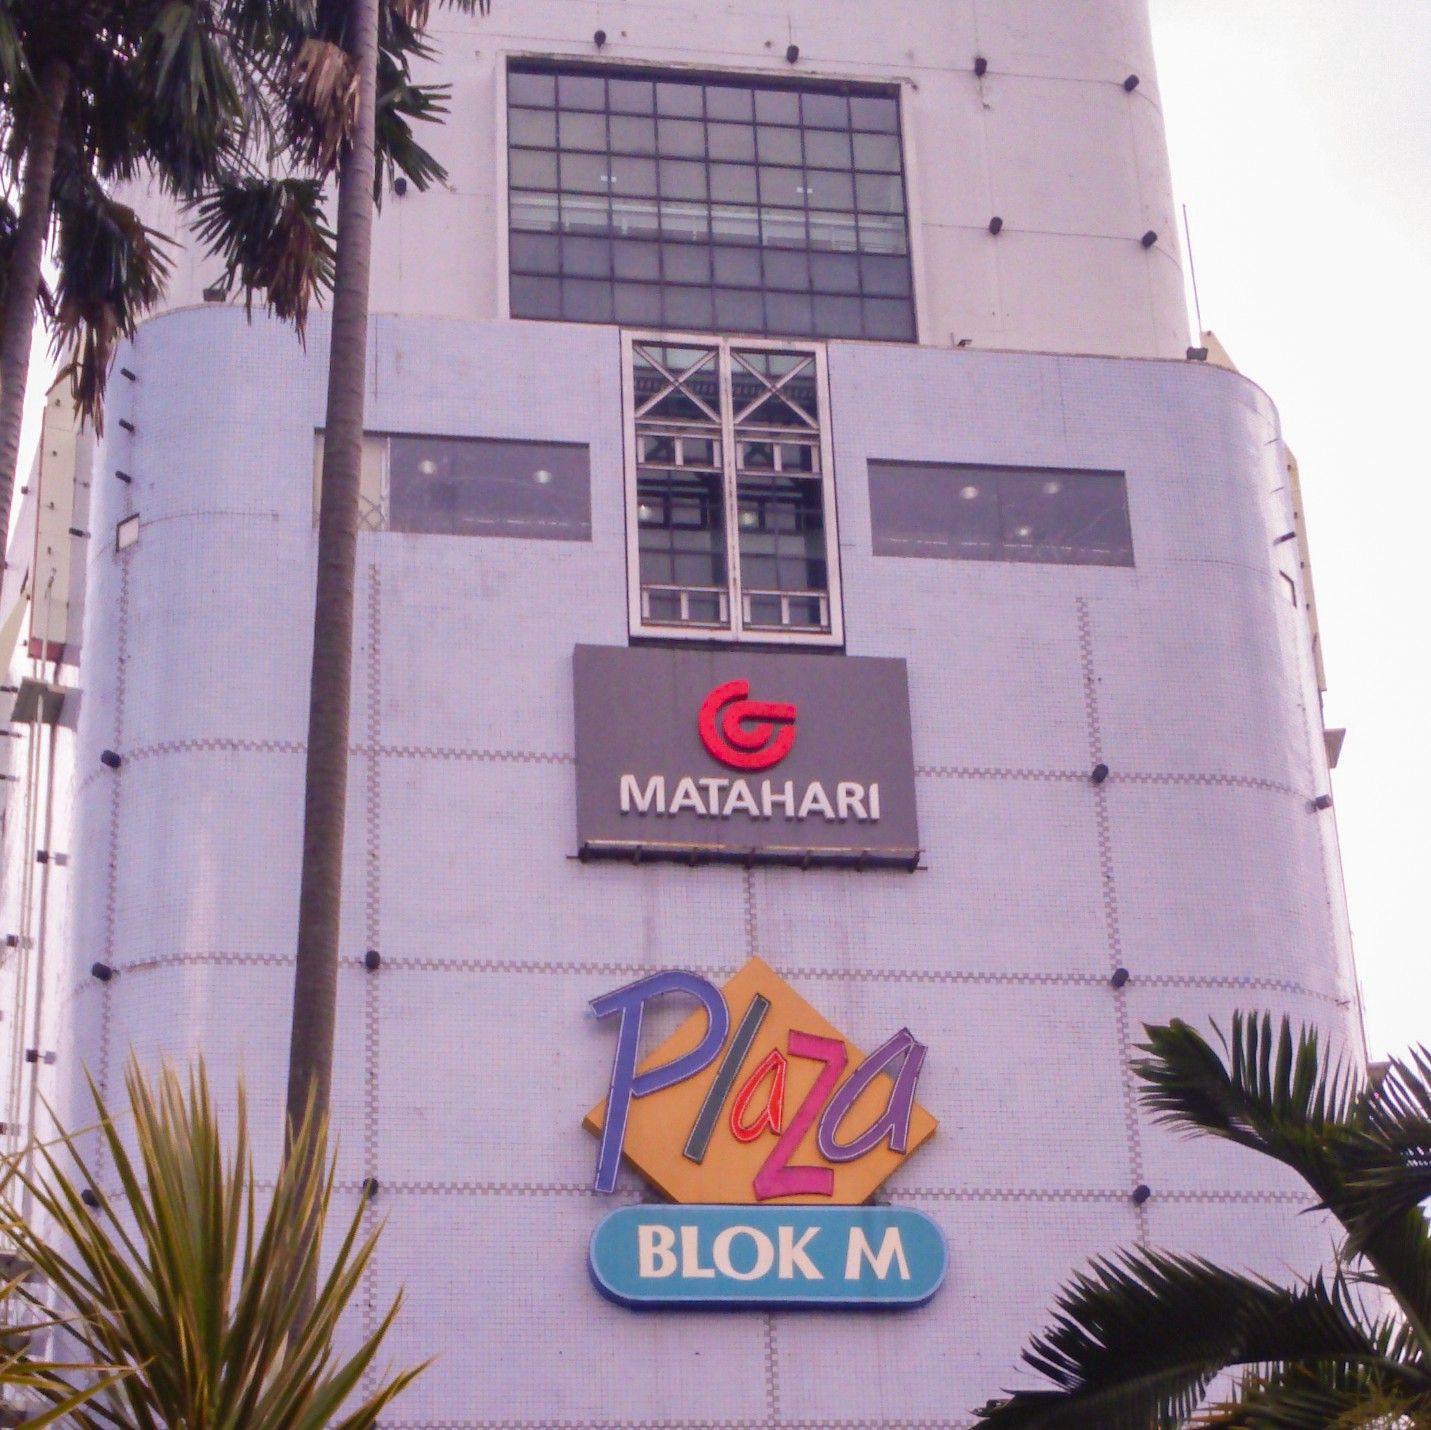 Pusat perbelanjaan Blok M Plaza di Kebayoran Baru, Jakarta